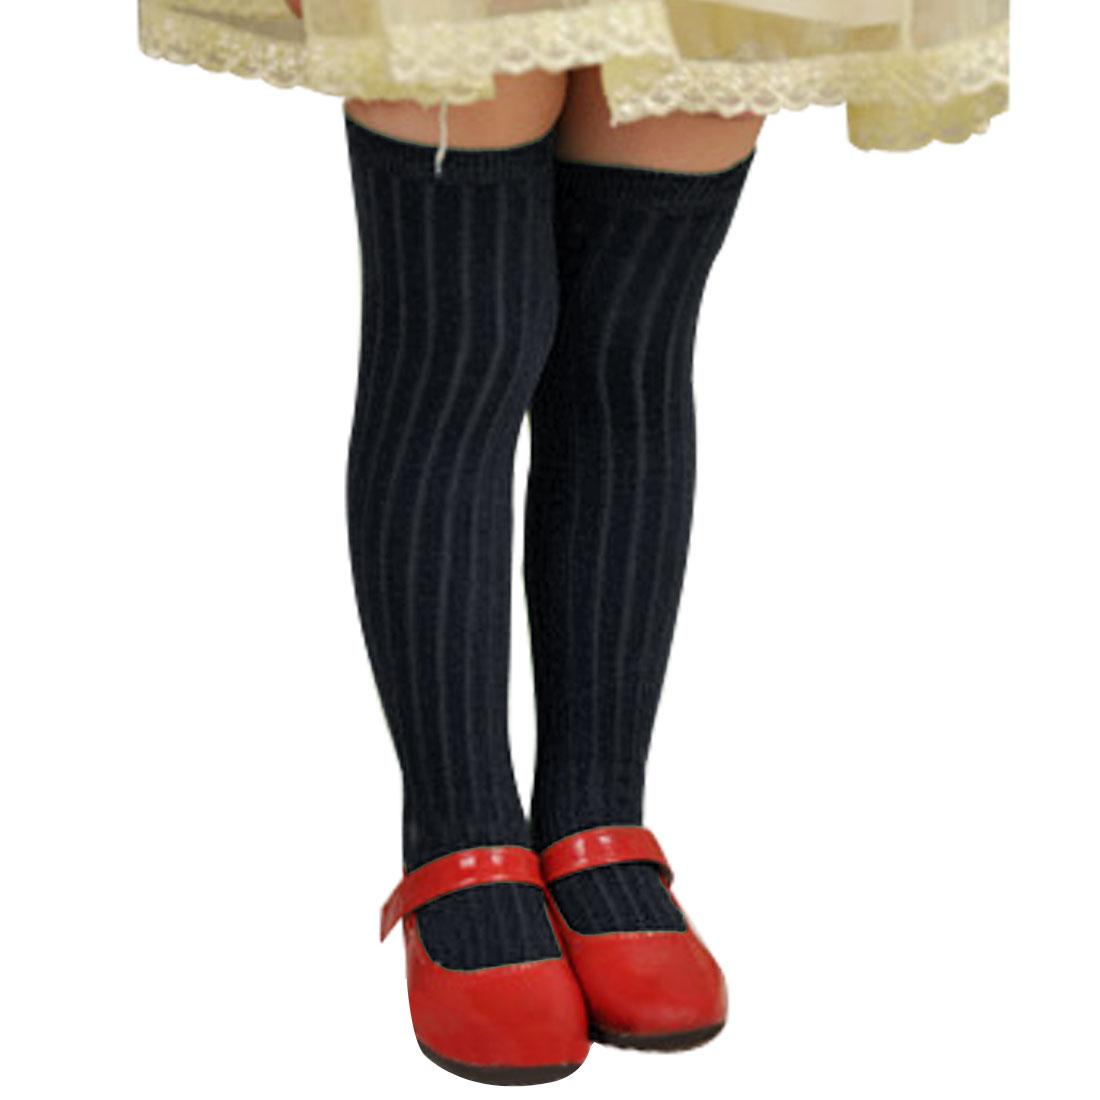 Girls Winter Stretchy Textured Hosiery Princess Socks Sockings Navy Blue